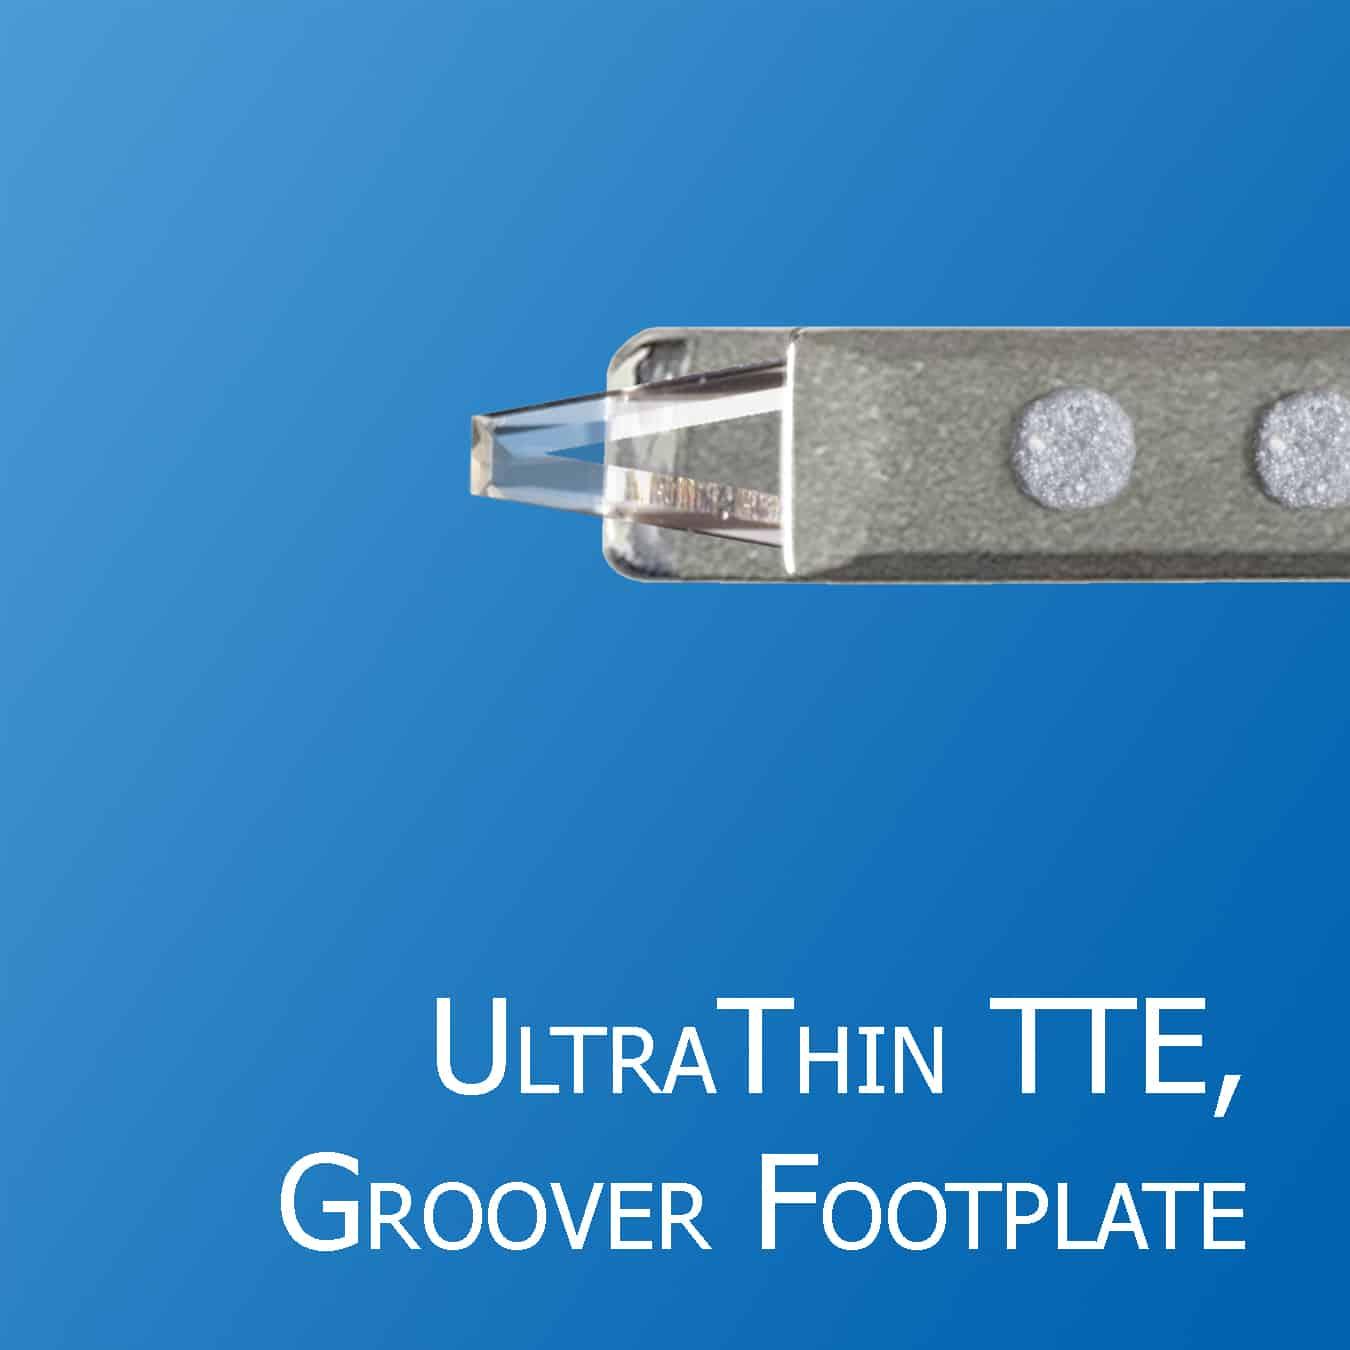 Truncated Triple Edge, UltraThin, Groover Footplate